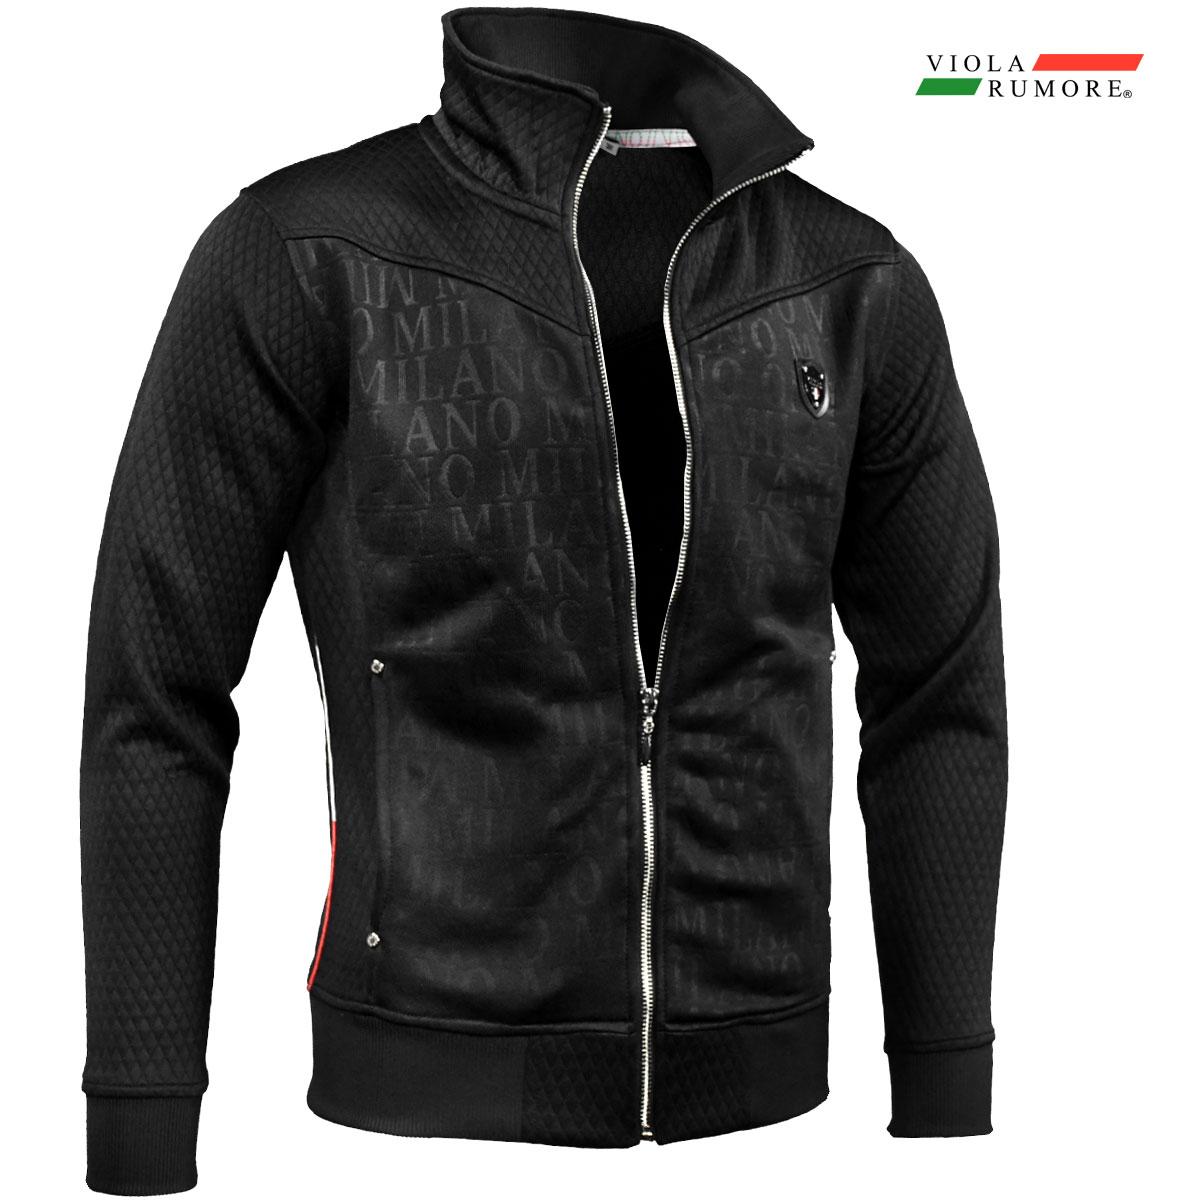 VIOLA rumore ヴィオラ ビオラ ジップアップジャケット メンズ スタンドカラー エンボス 長袖 スウェット mens(ブラック黒)